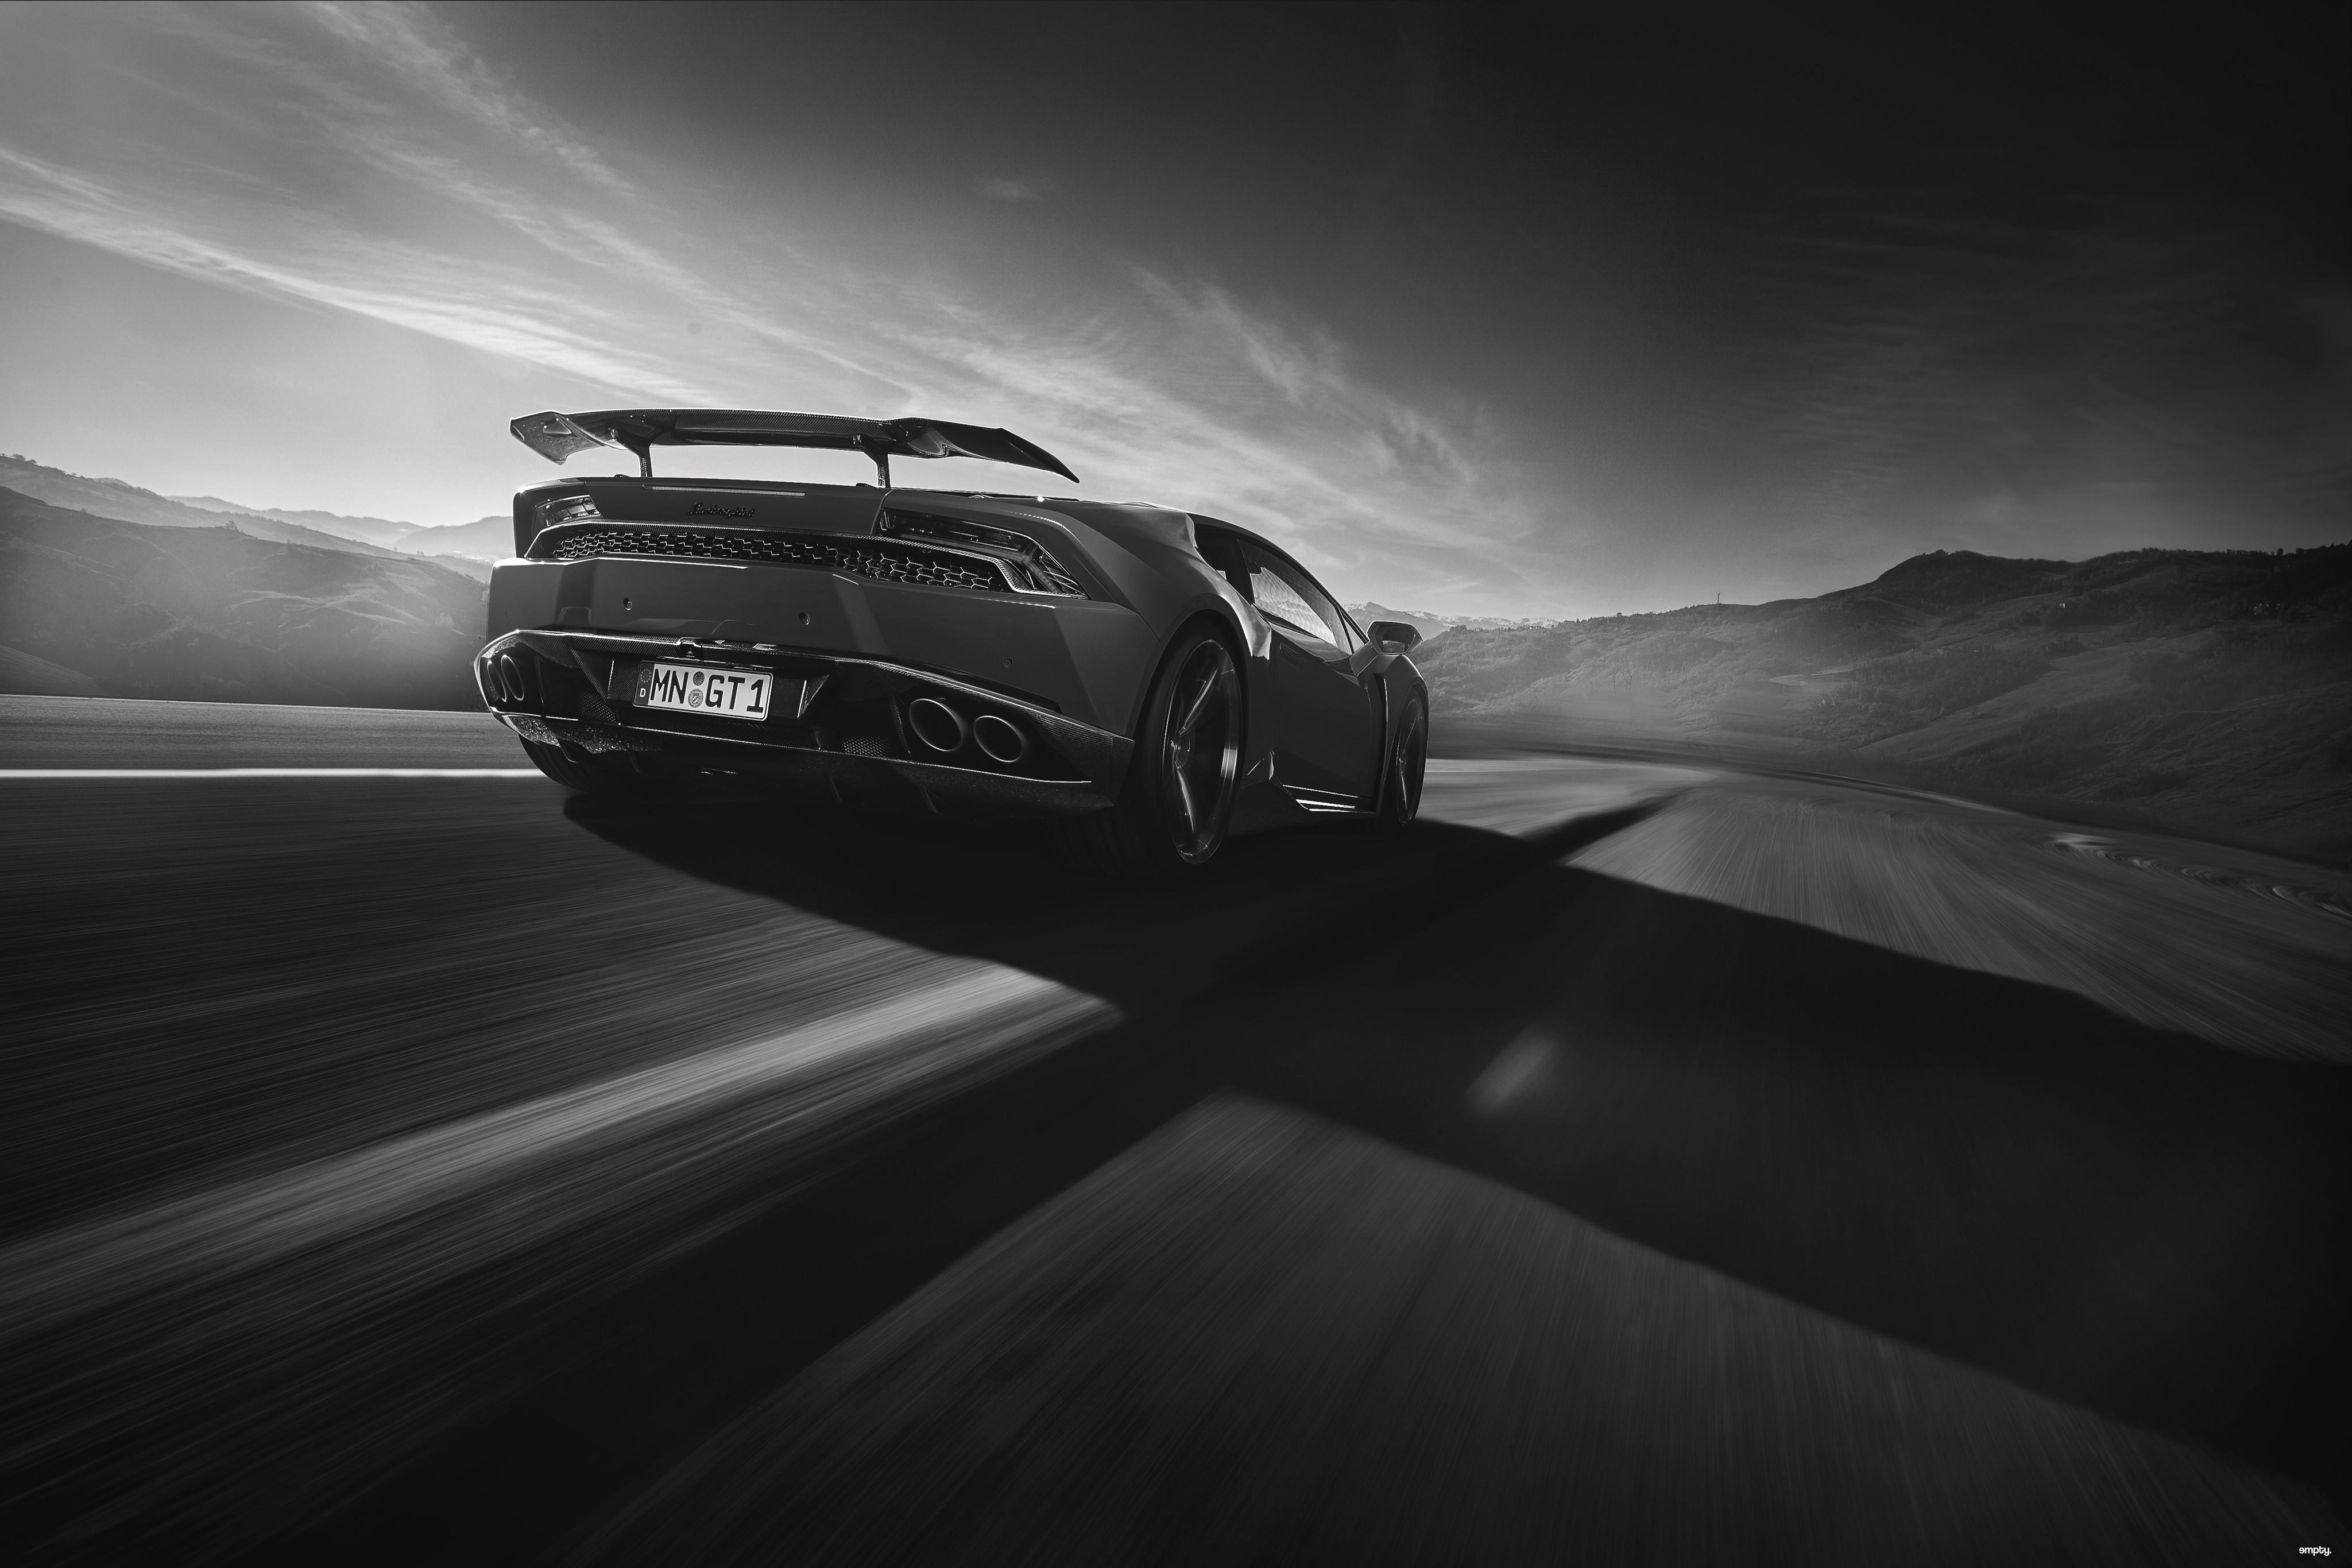 warna grand new avanza 2018 veloz gambar mobil sport hitam terbaru   sobat modifikasi